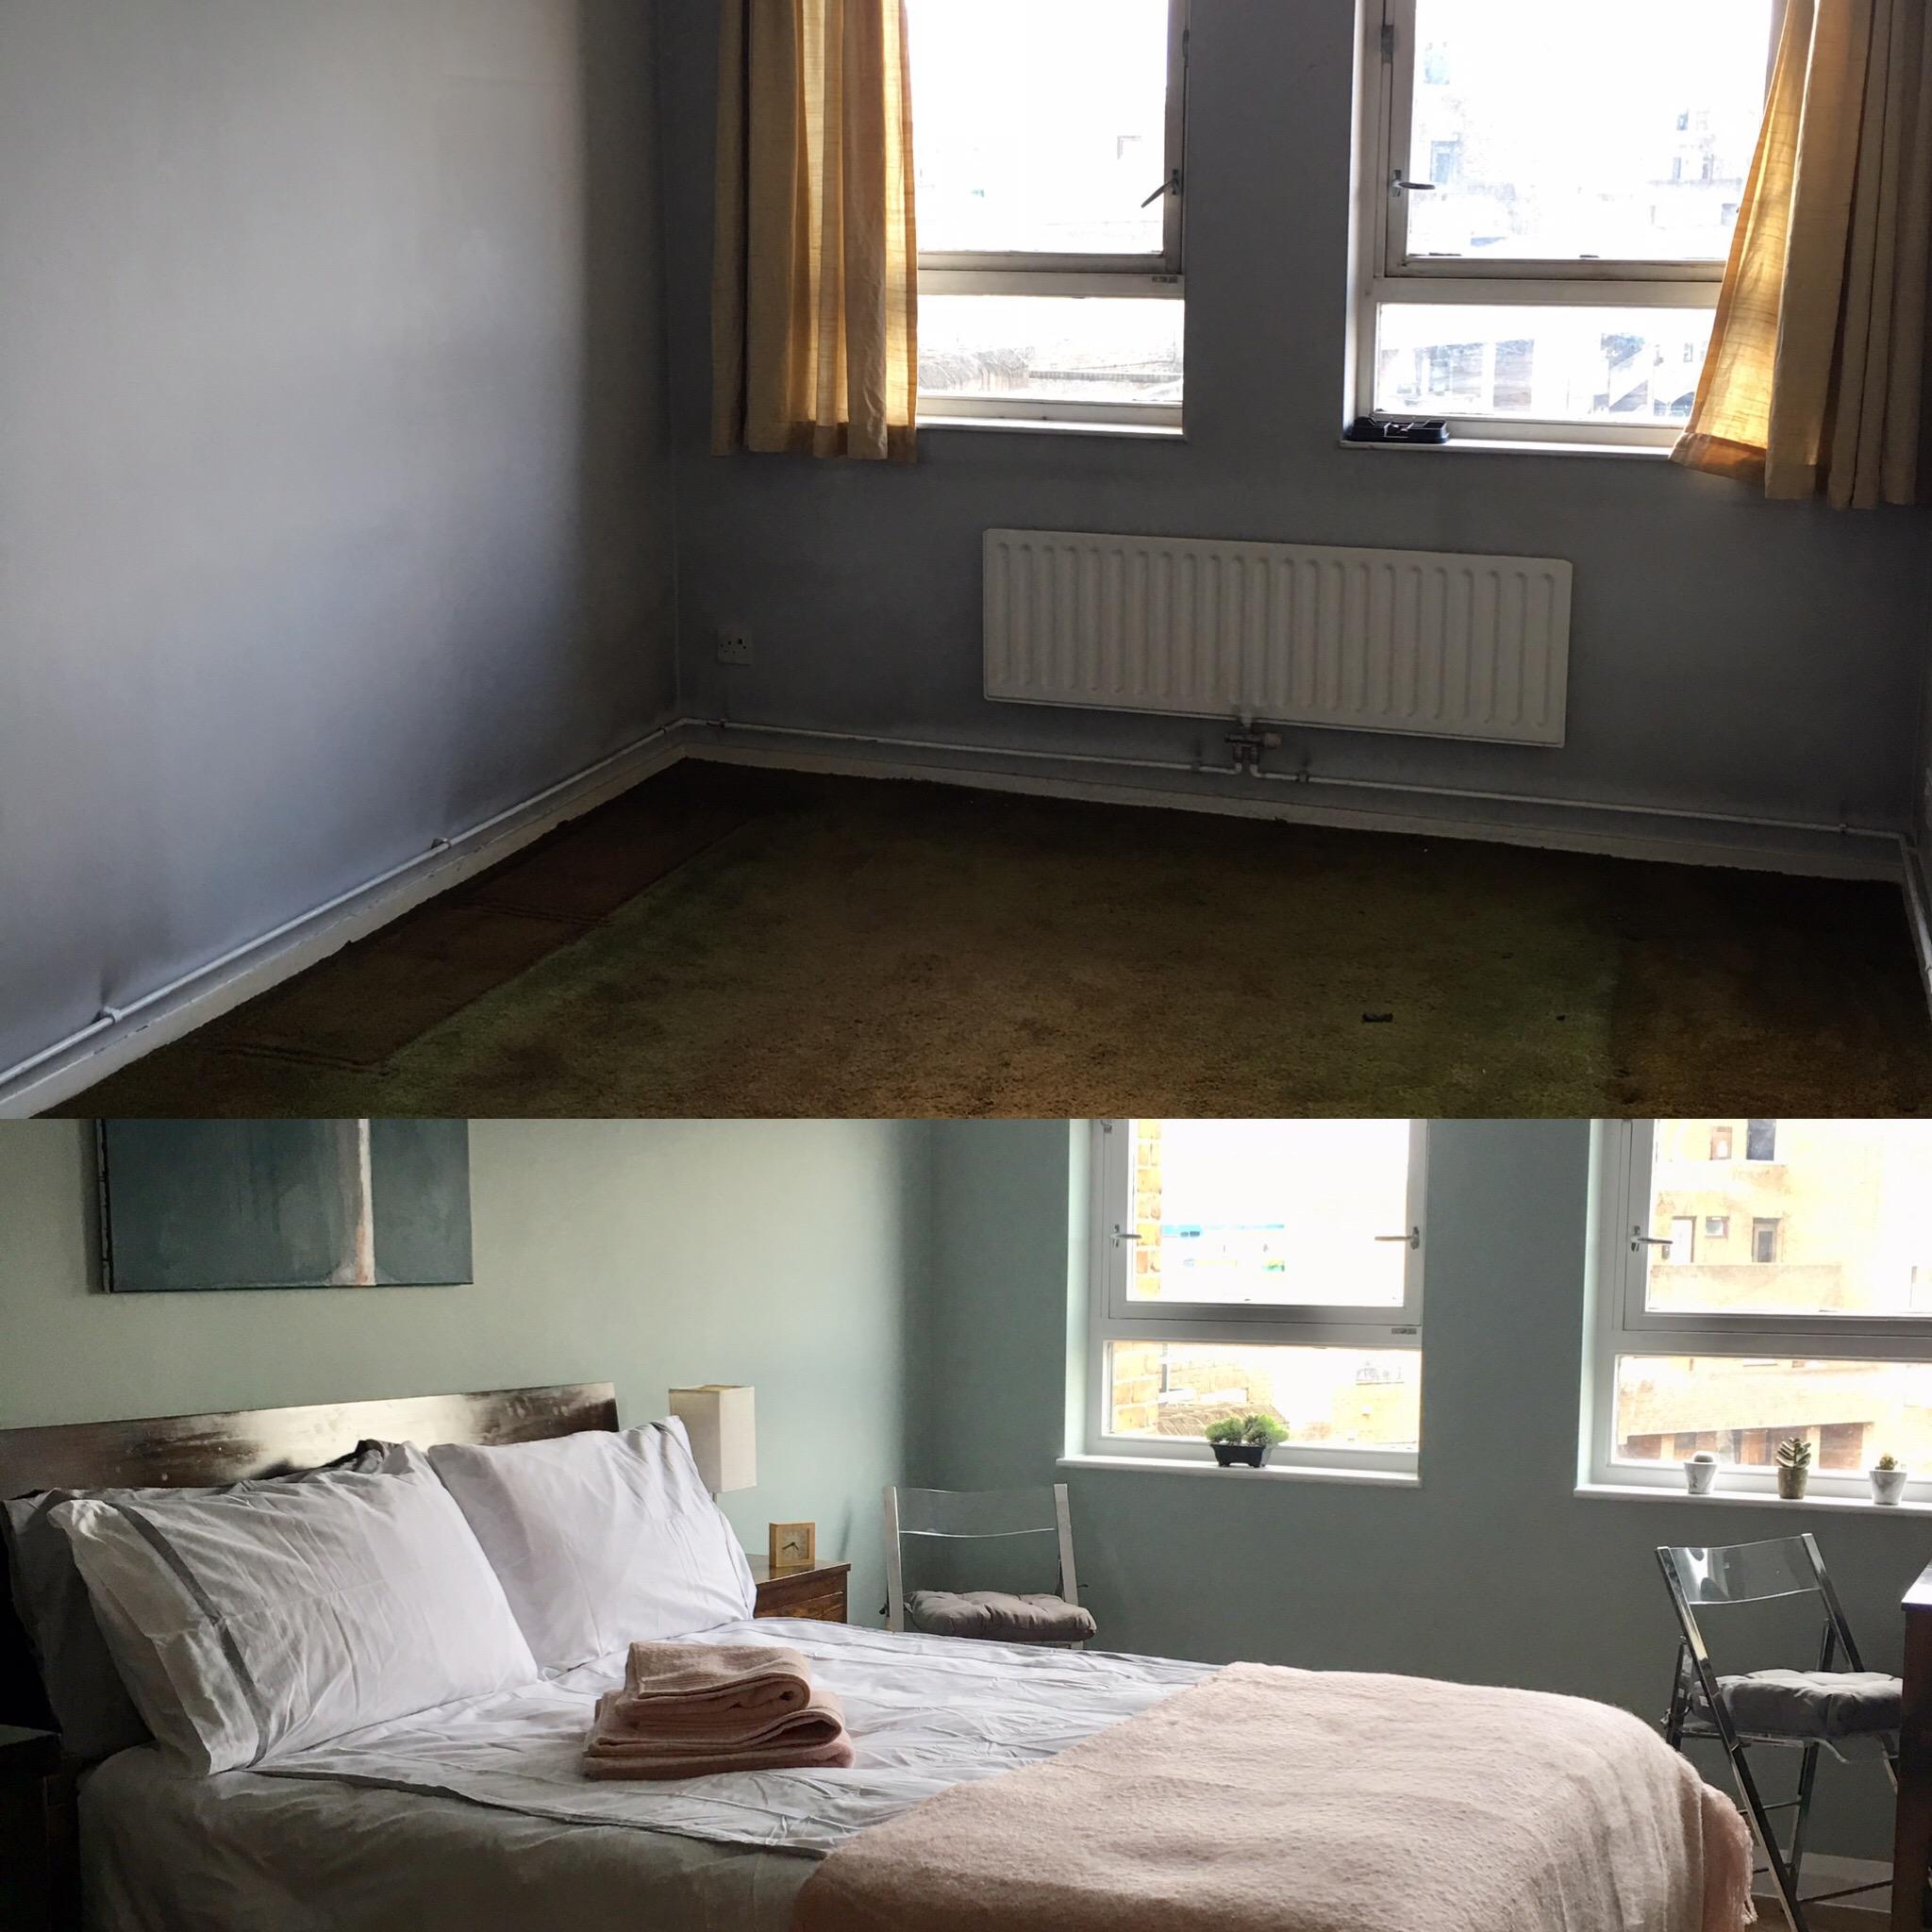 bedroom_before_after.jpg